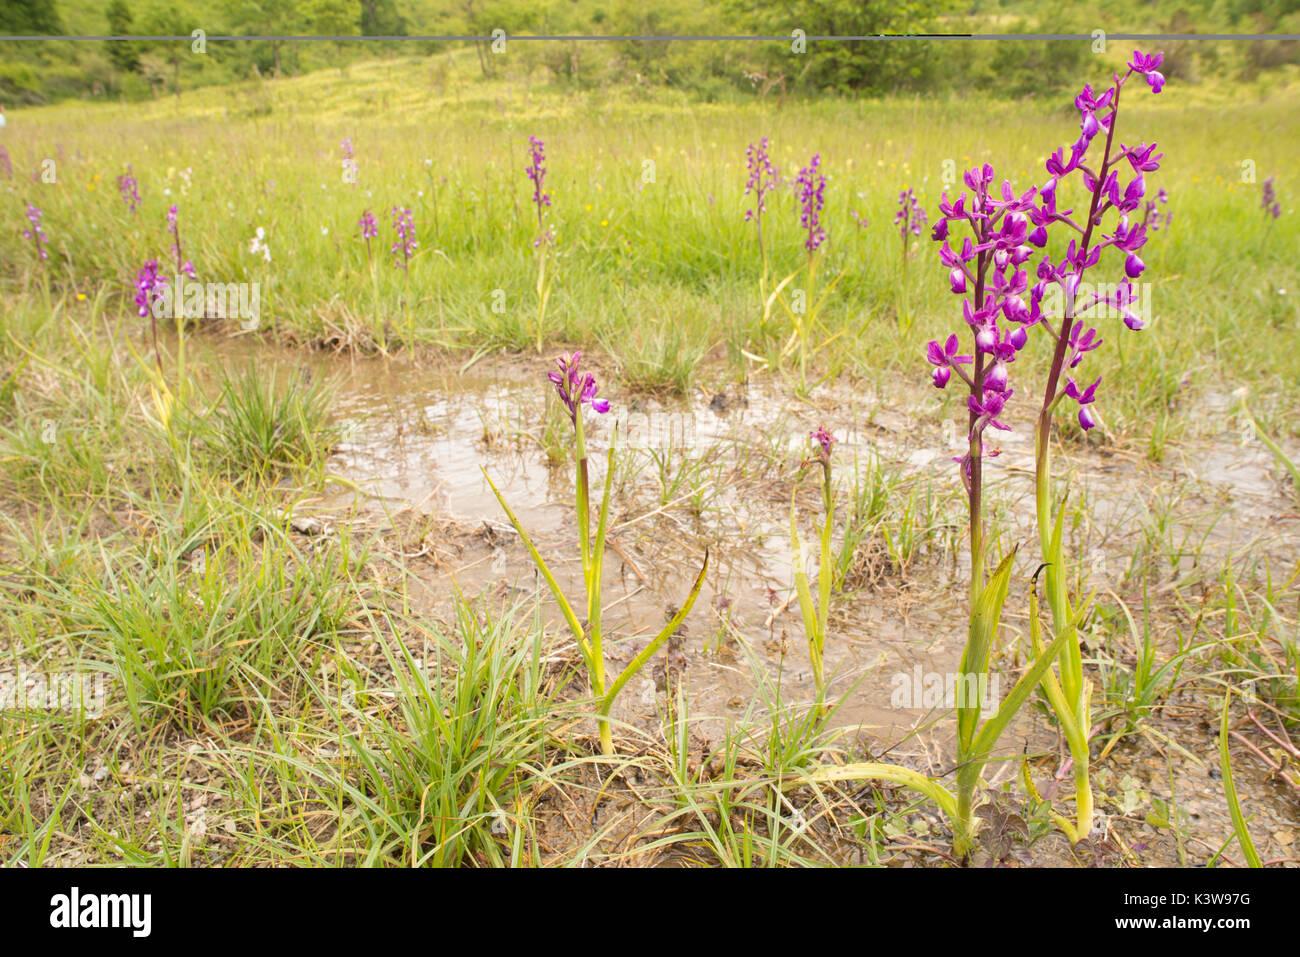 Wild orchid, Anacamptis laxiflora bloom in its specific habitat - Stock Image